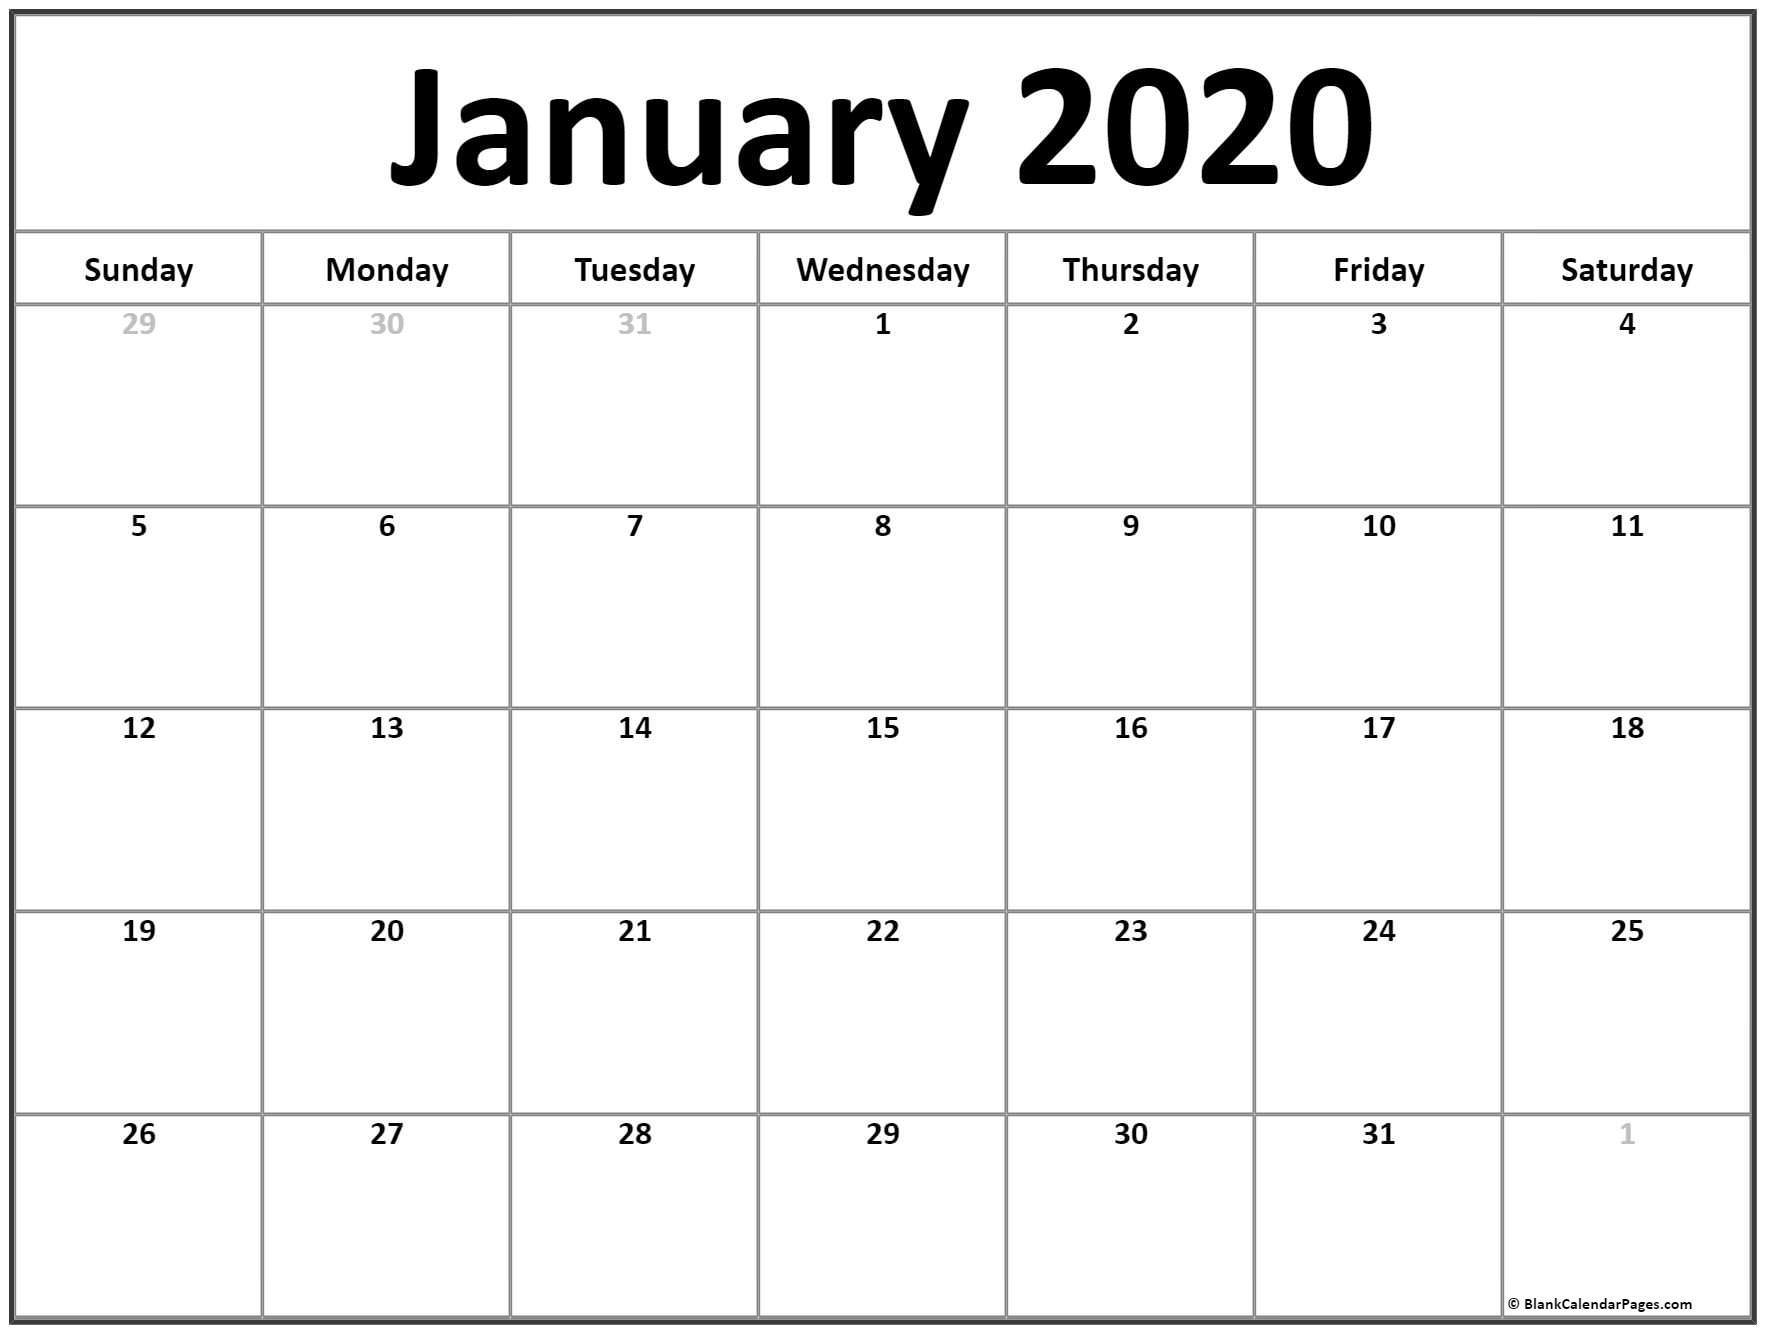 January 2020 Calendar B17 16 Calendar 2020 January - Calendar-January 2020 Calendar In Kannada